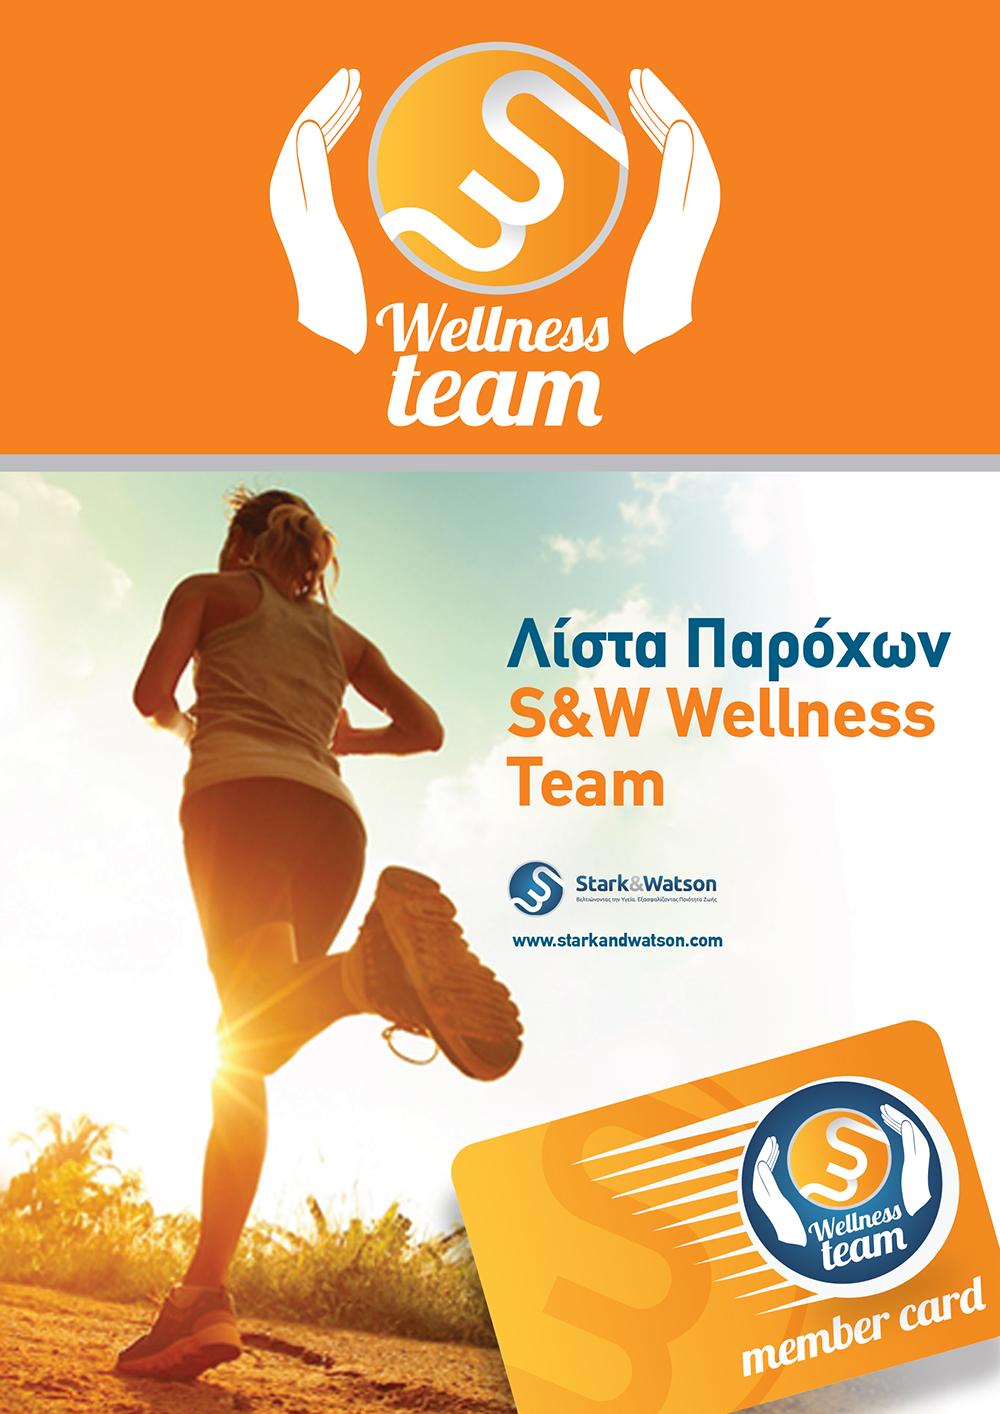 Stark & Watson Wellness team